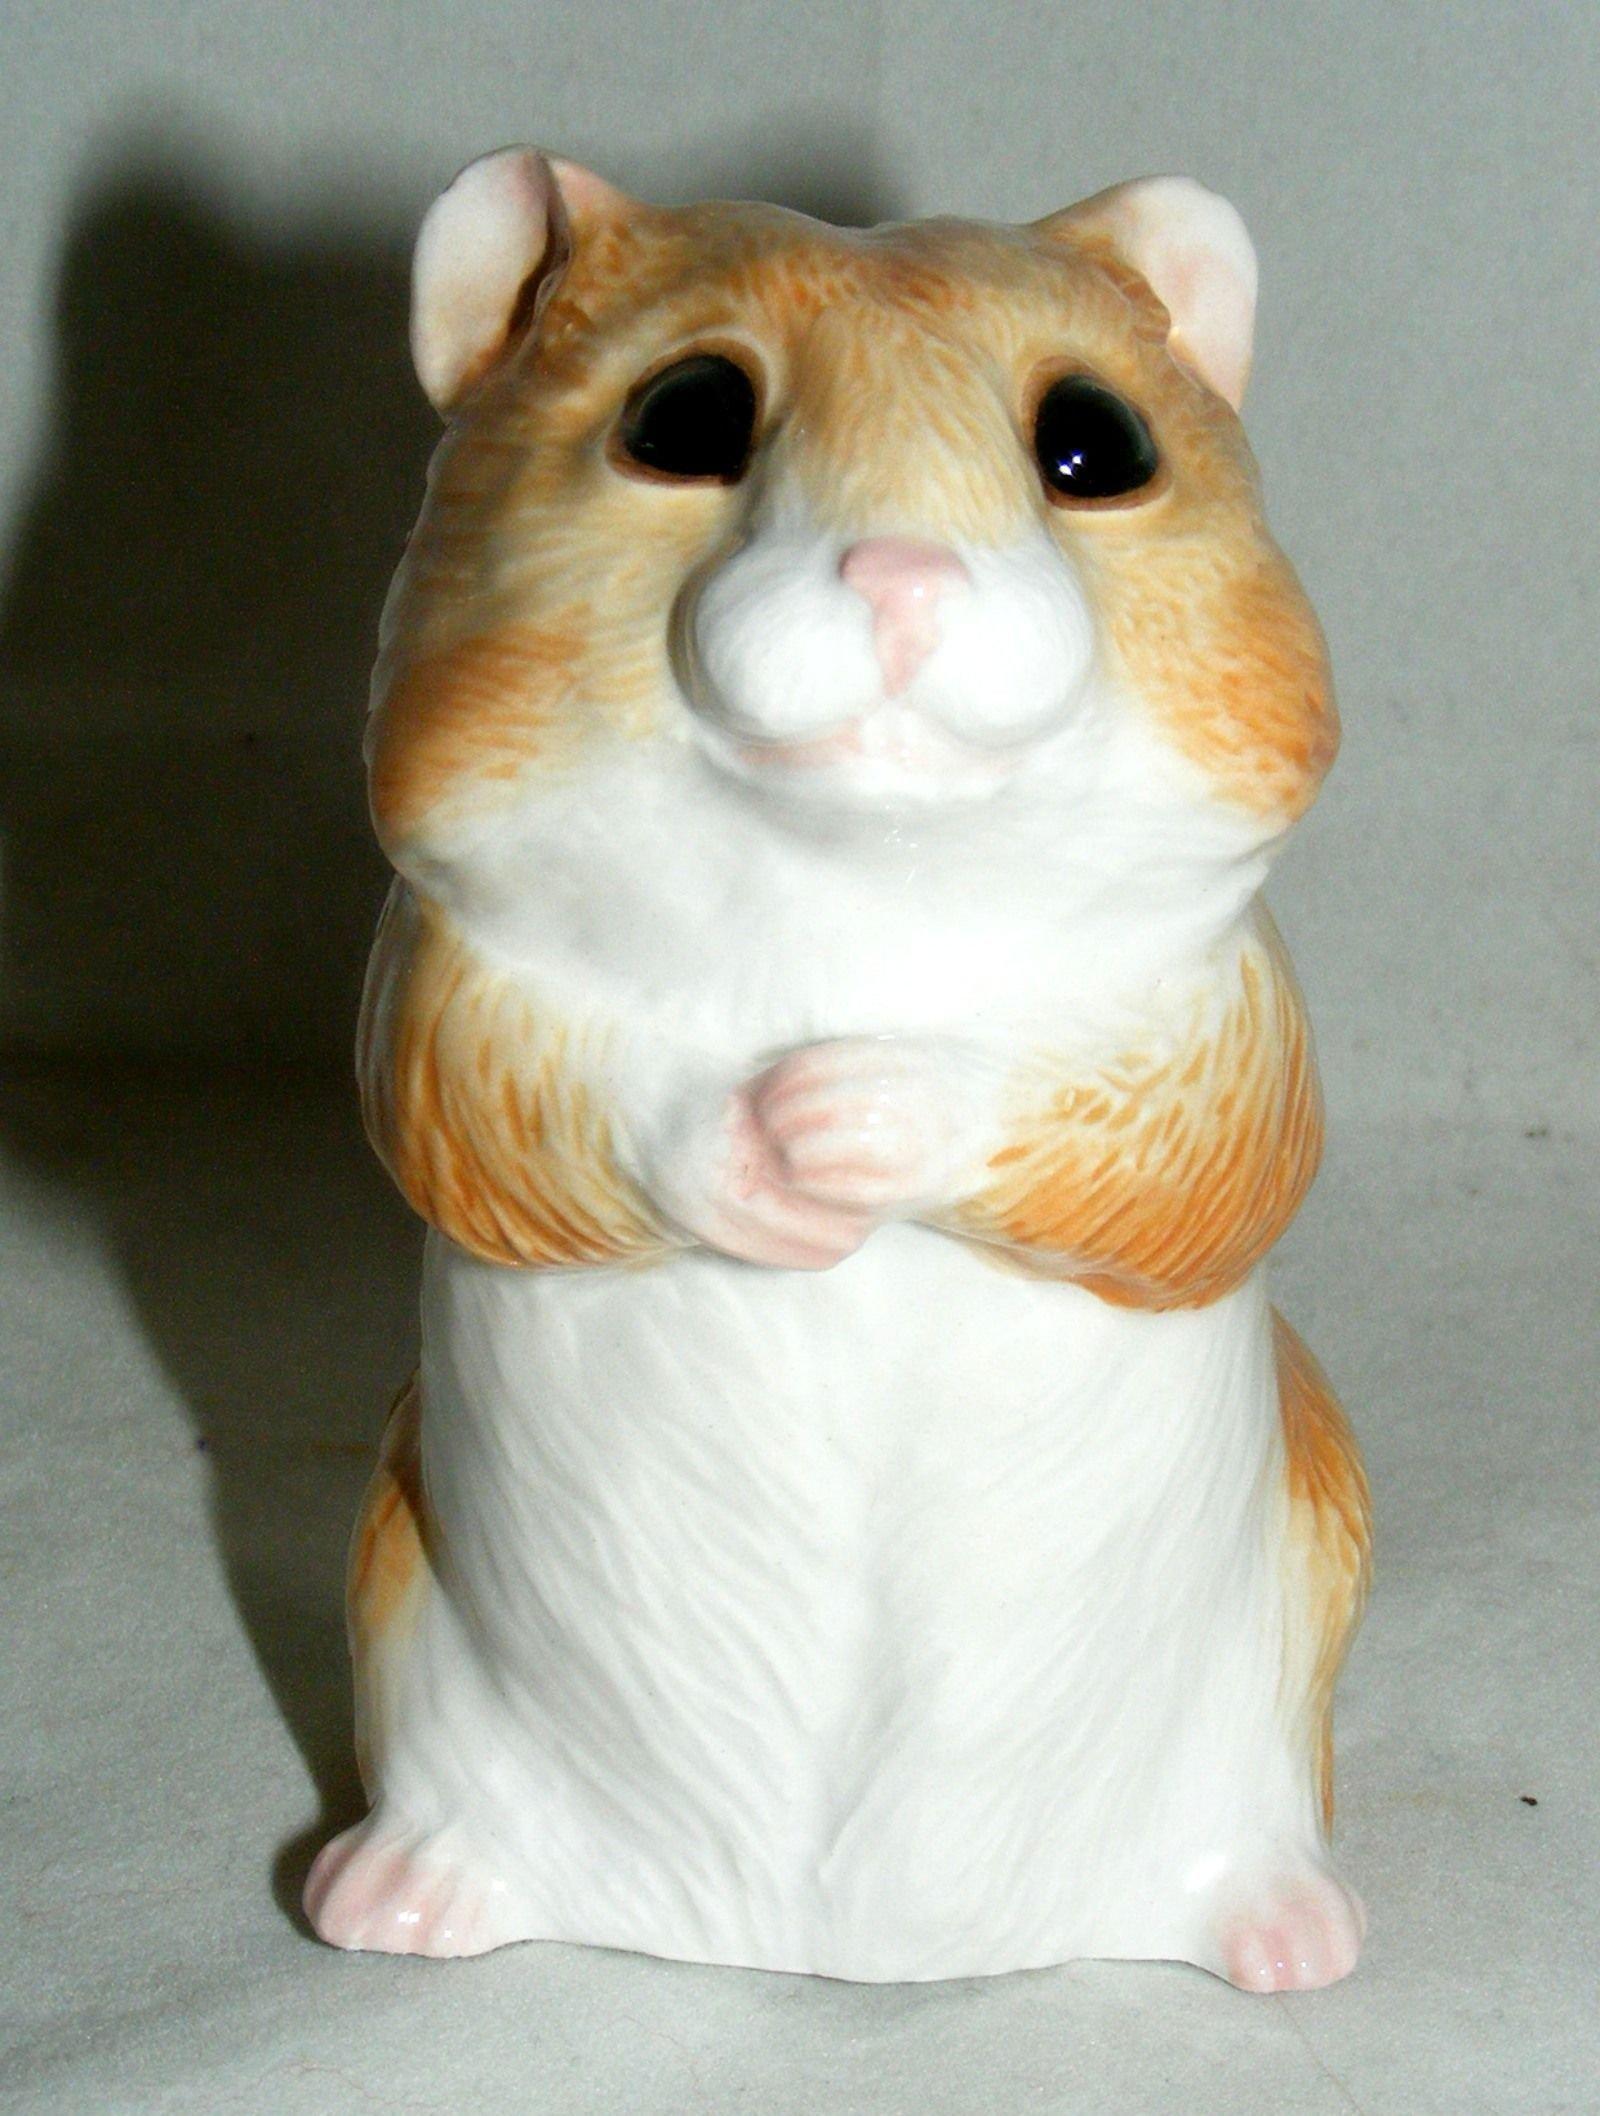 John Beswick Rspca Animal Figure The Adorables Hamster Jbta3